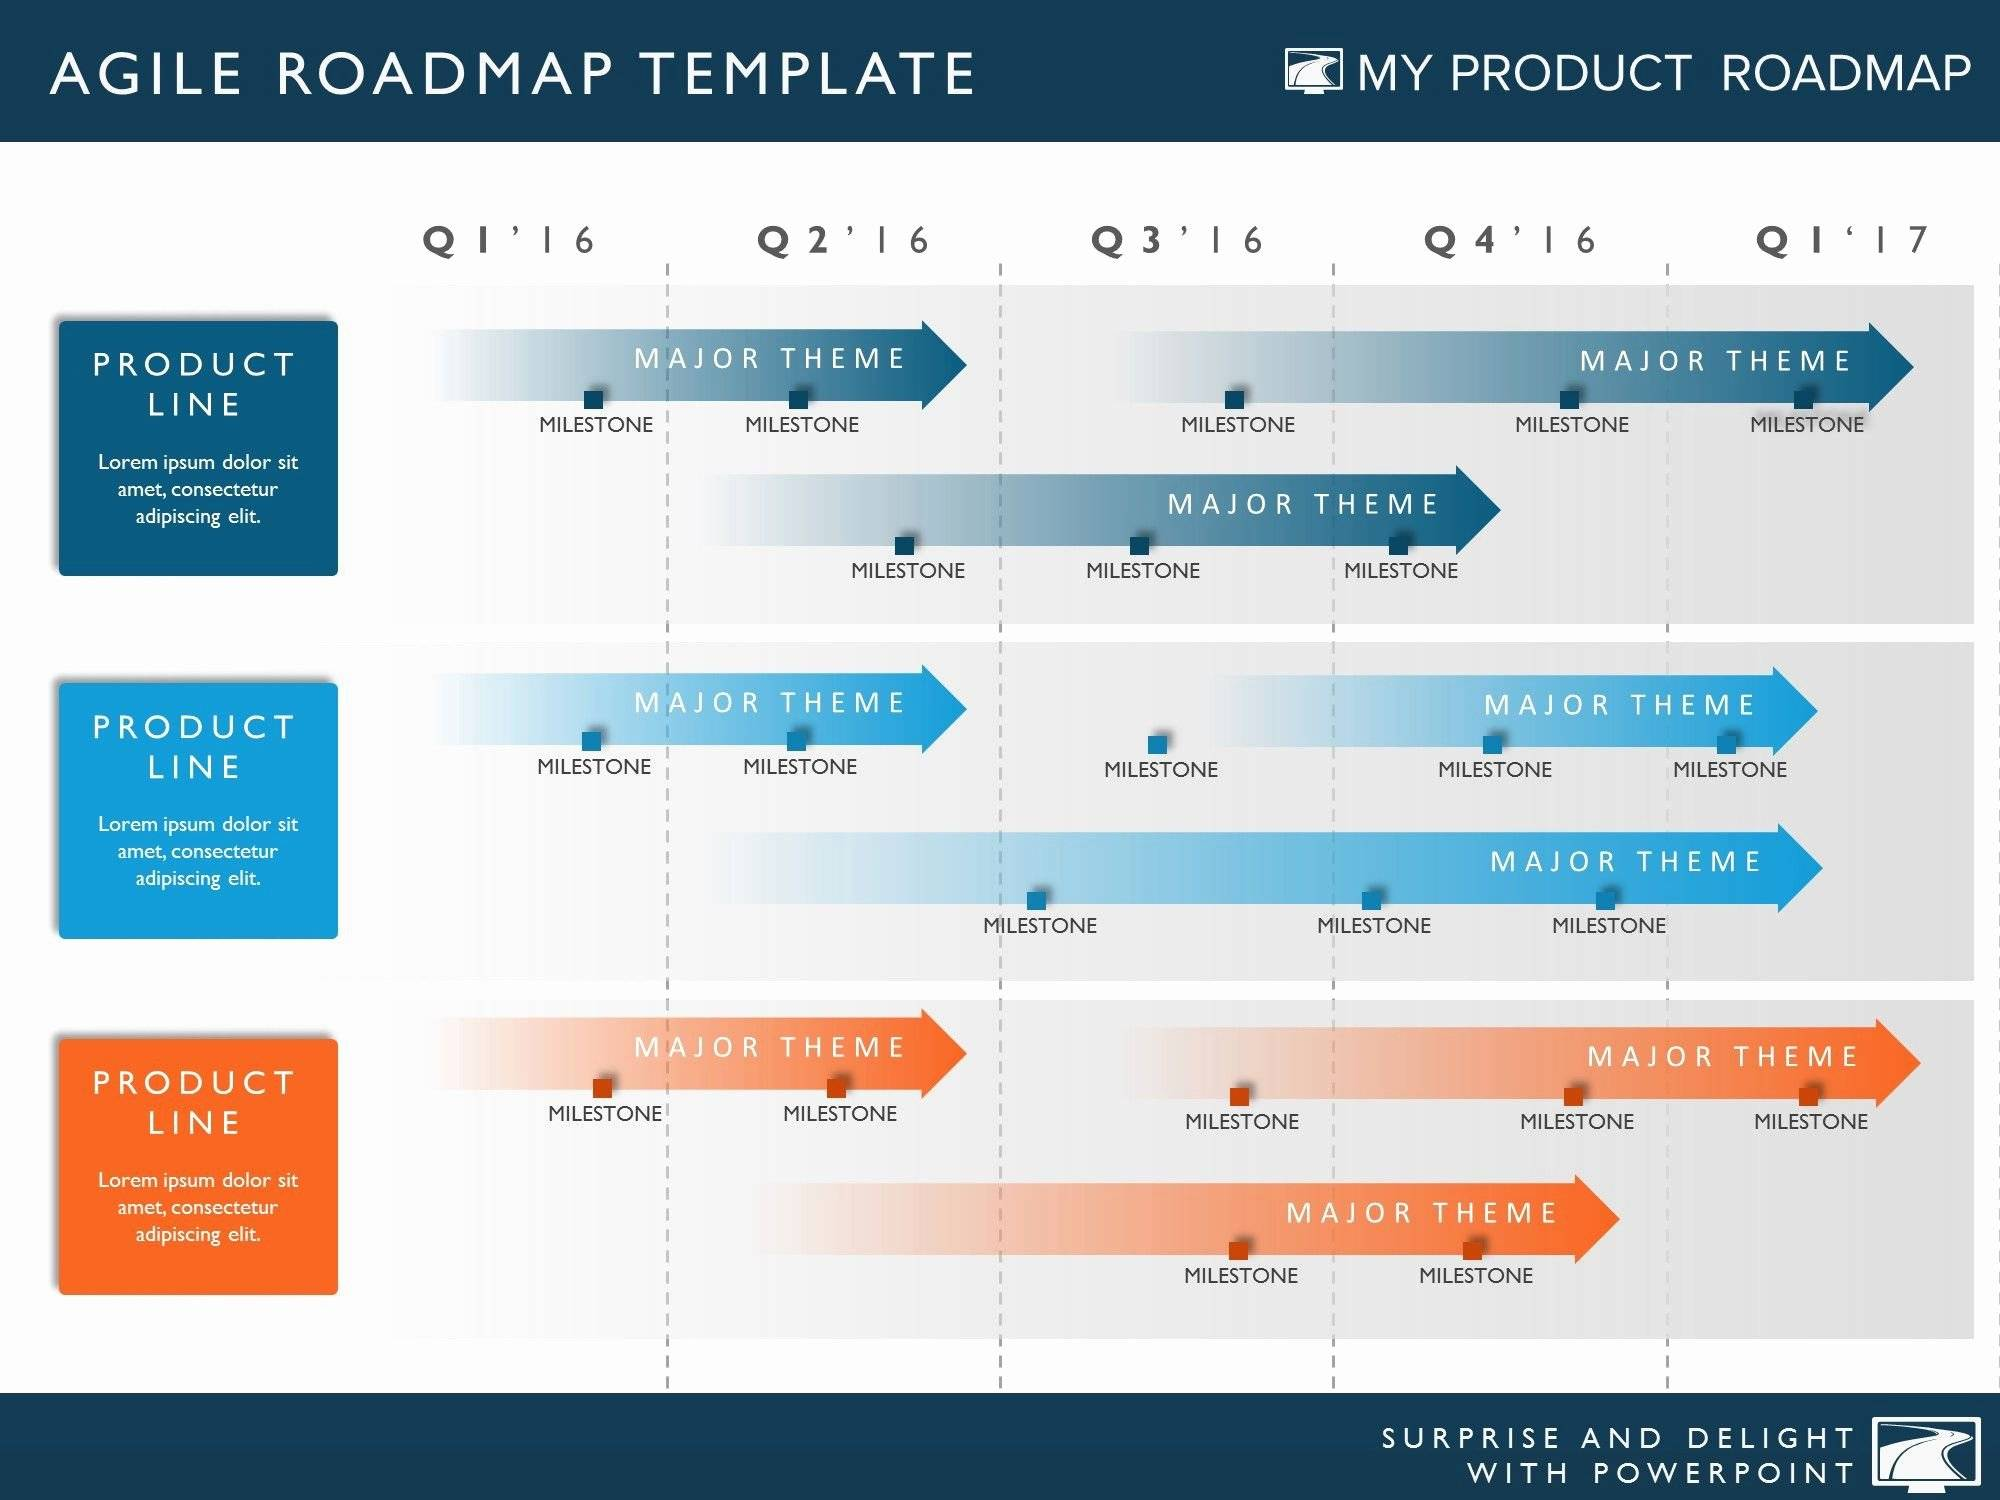 Microsoft Powerpoint Roadmap Template Free